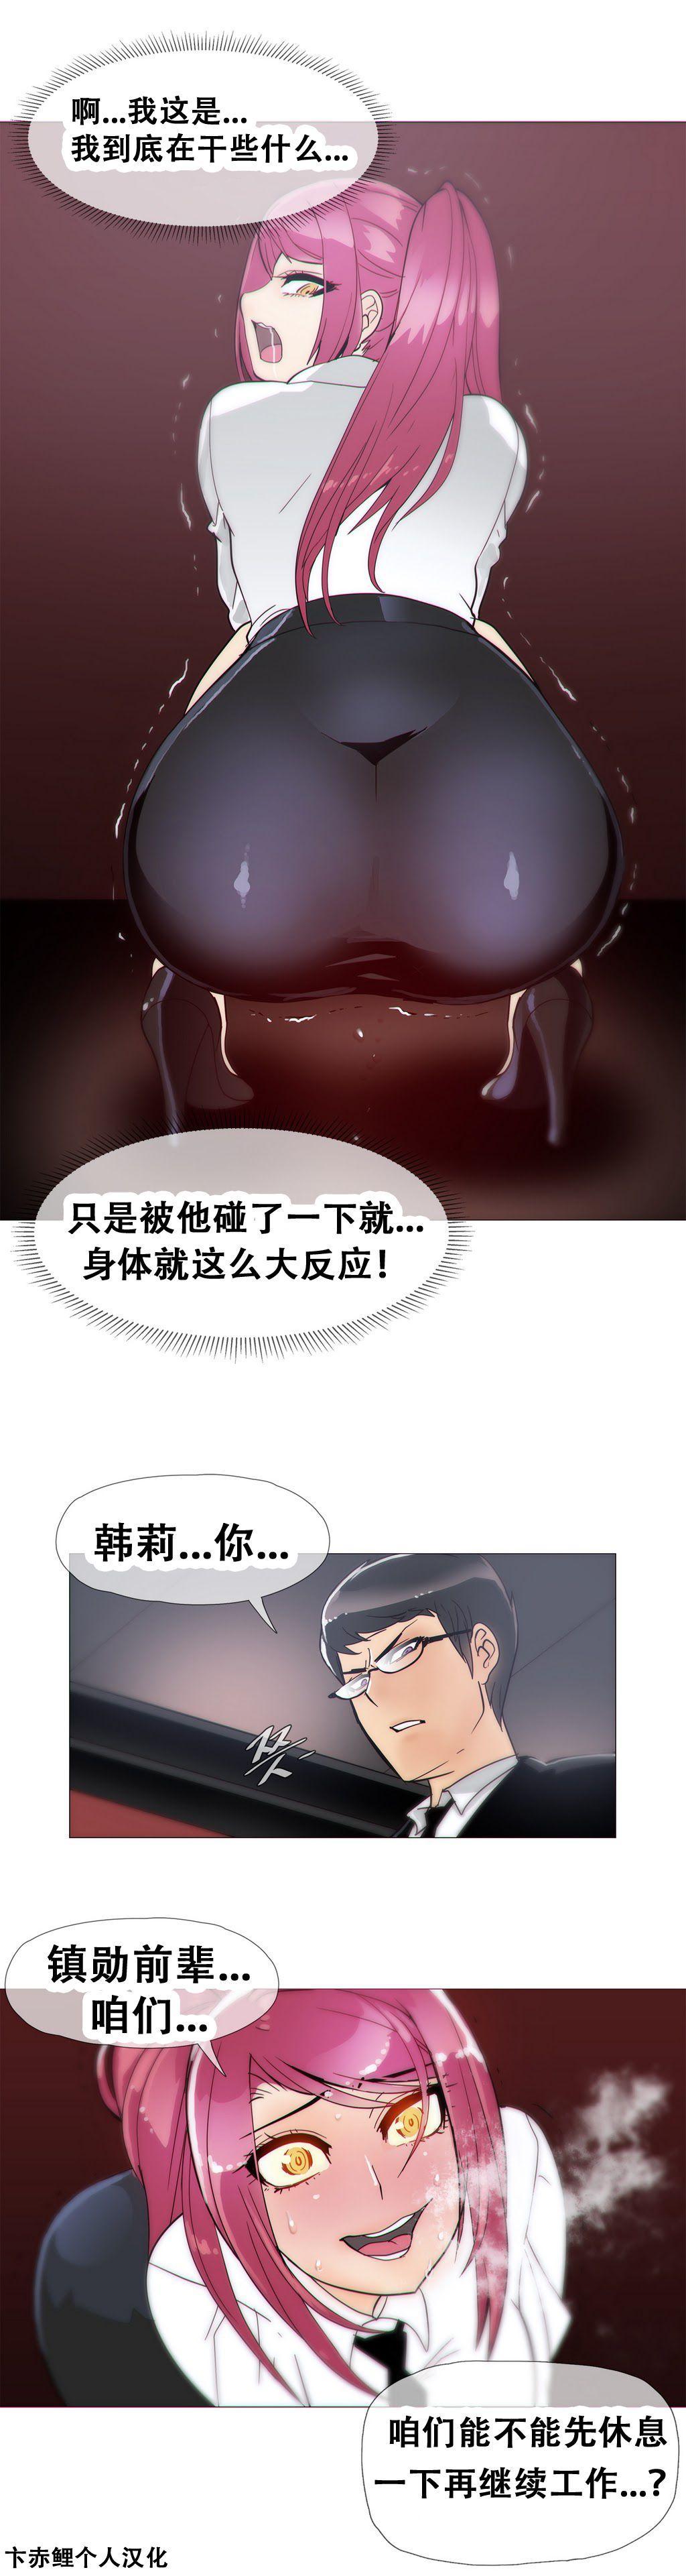 HouseHold Affairs 【卞赤鲤个人汉化】1~21话(持续更新中) 312